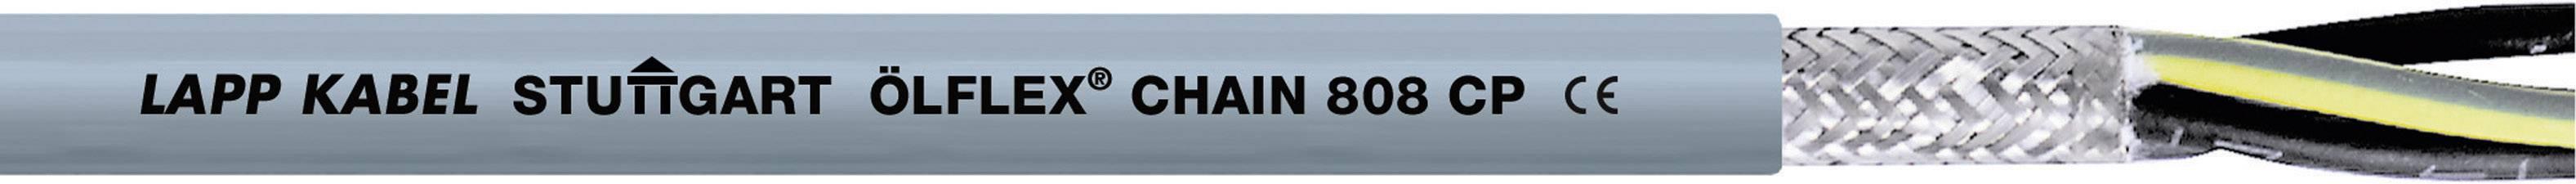 Žíla kabelu LappKabel ÖLFLEX CHAIN 808 CP 5G0,75 (1027762), 5x 0,75 mm², polyurethan, Ø 7,7 mm, stíněný, 50 m,